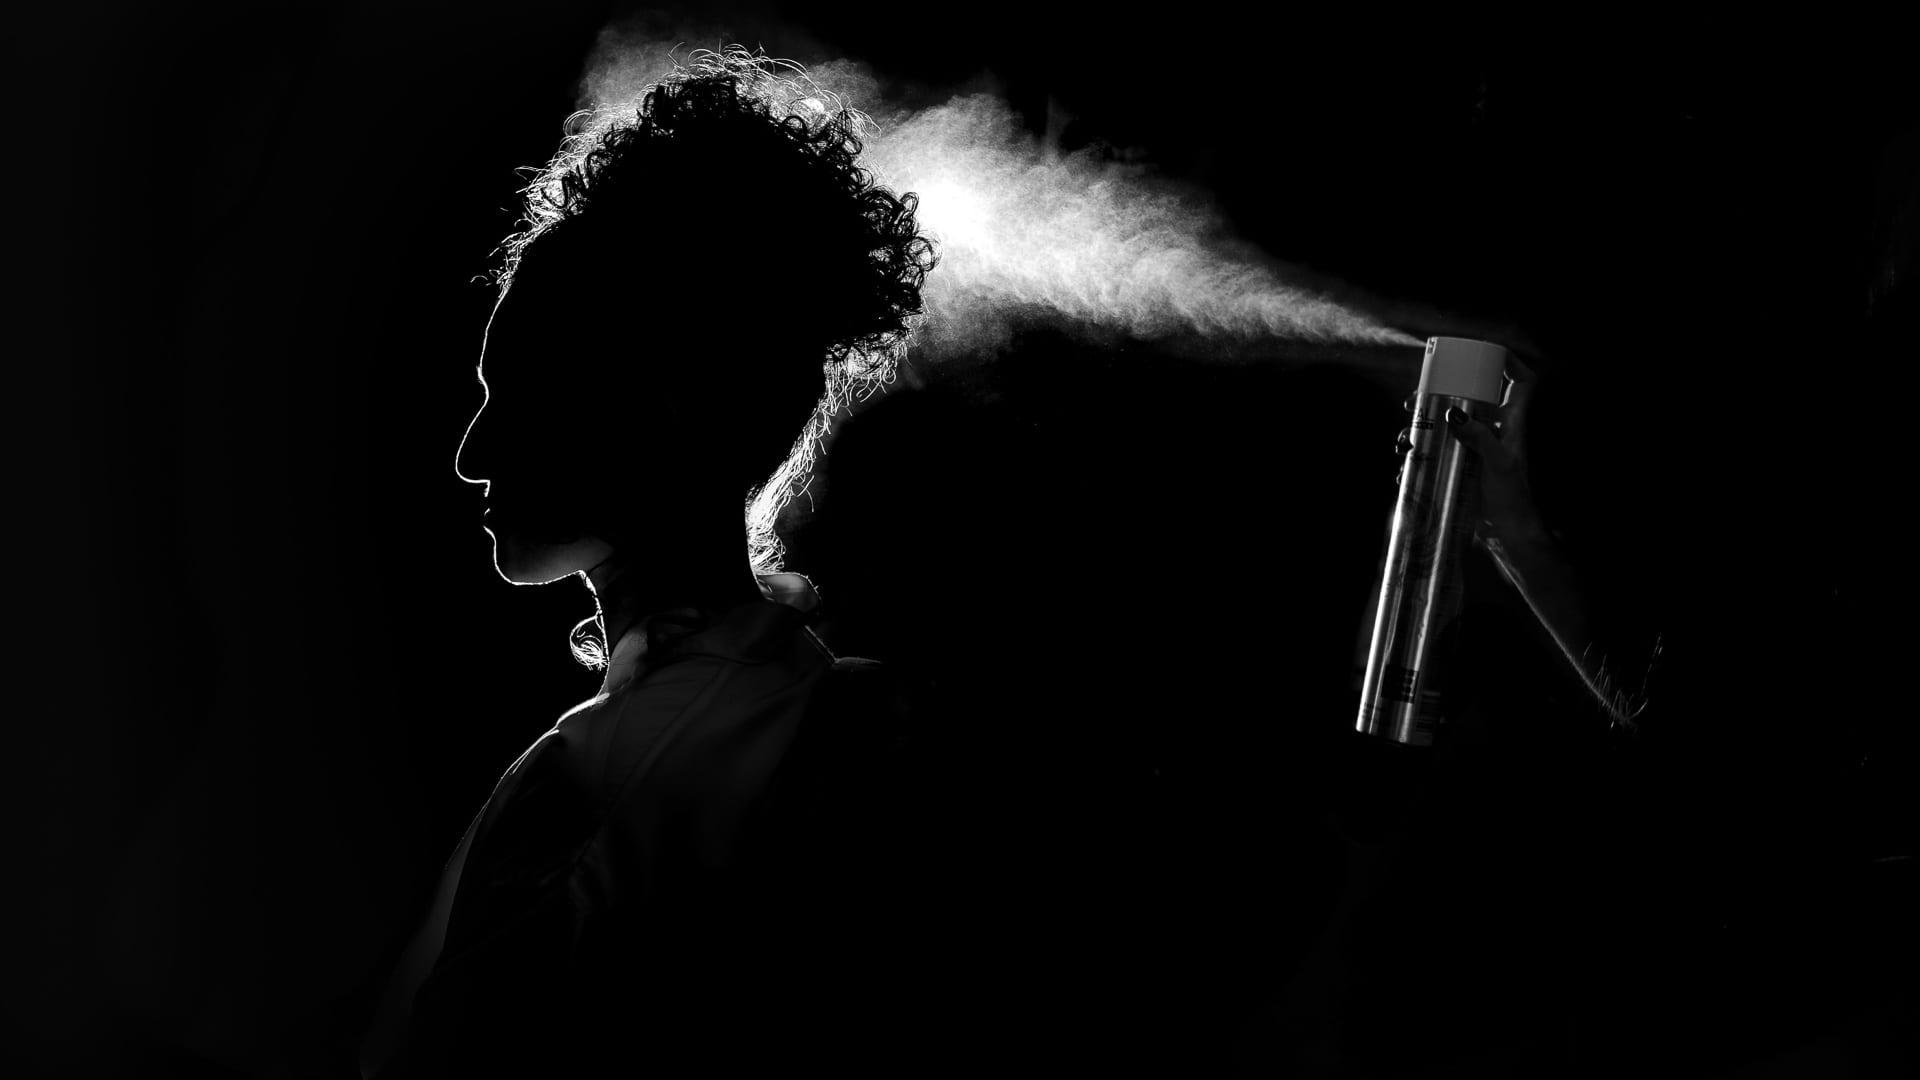 Backlit hairspray